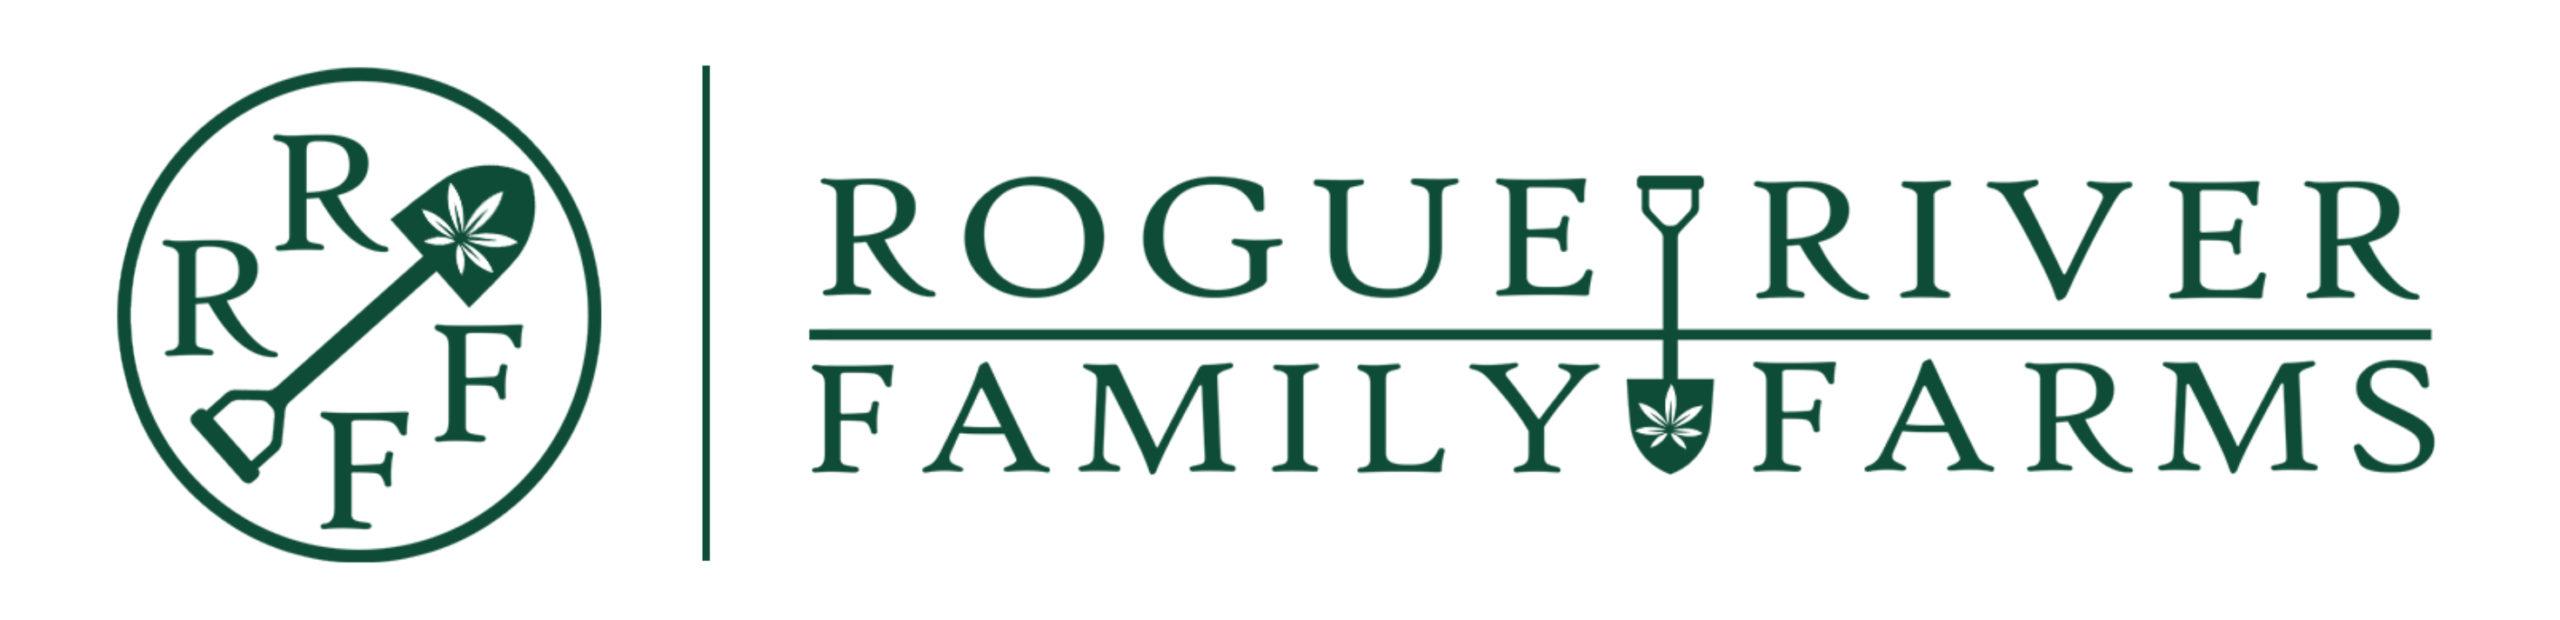 Rogue River Family Farms